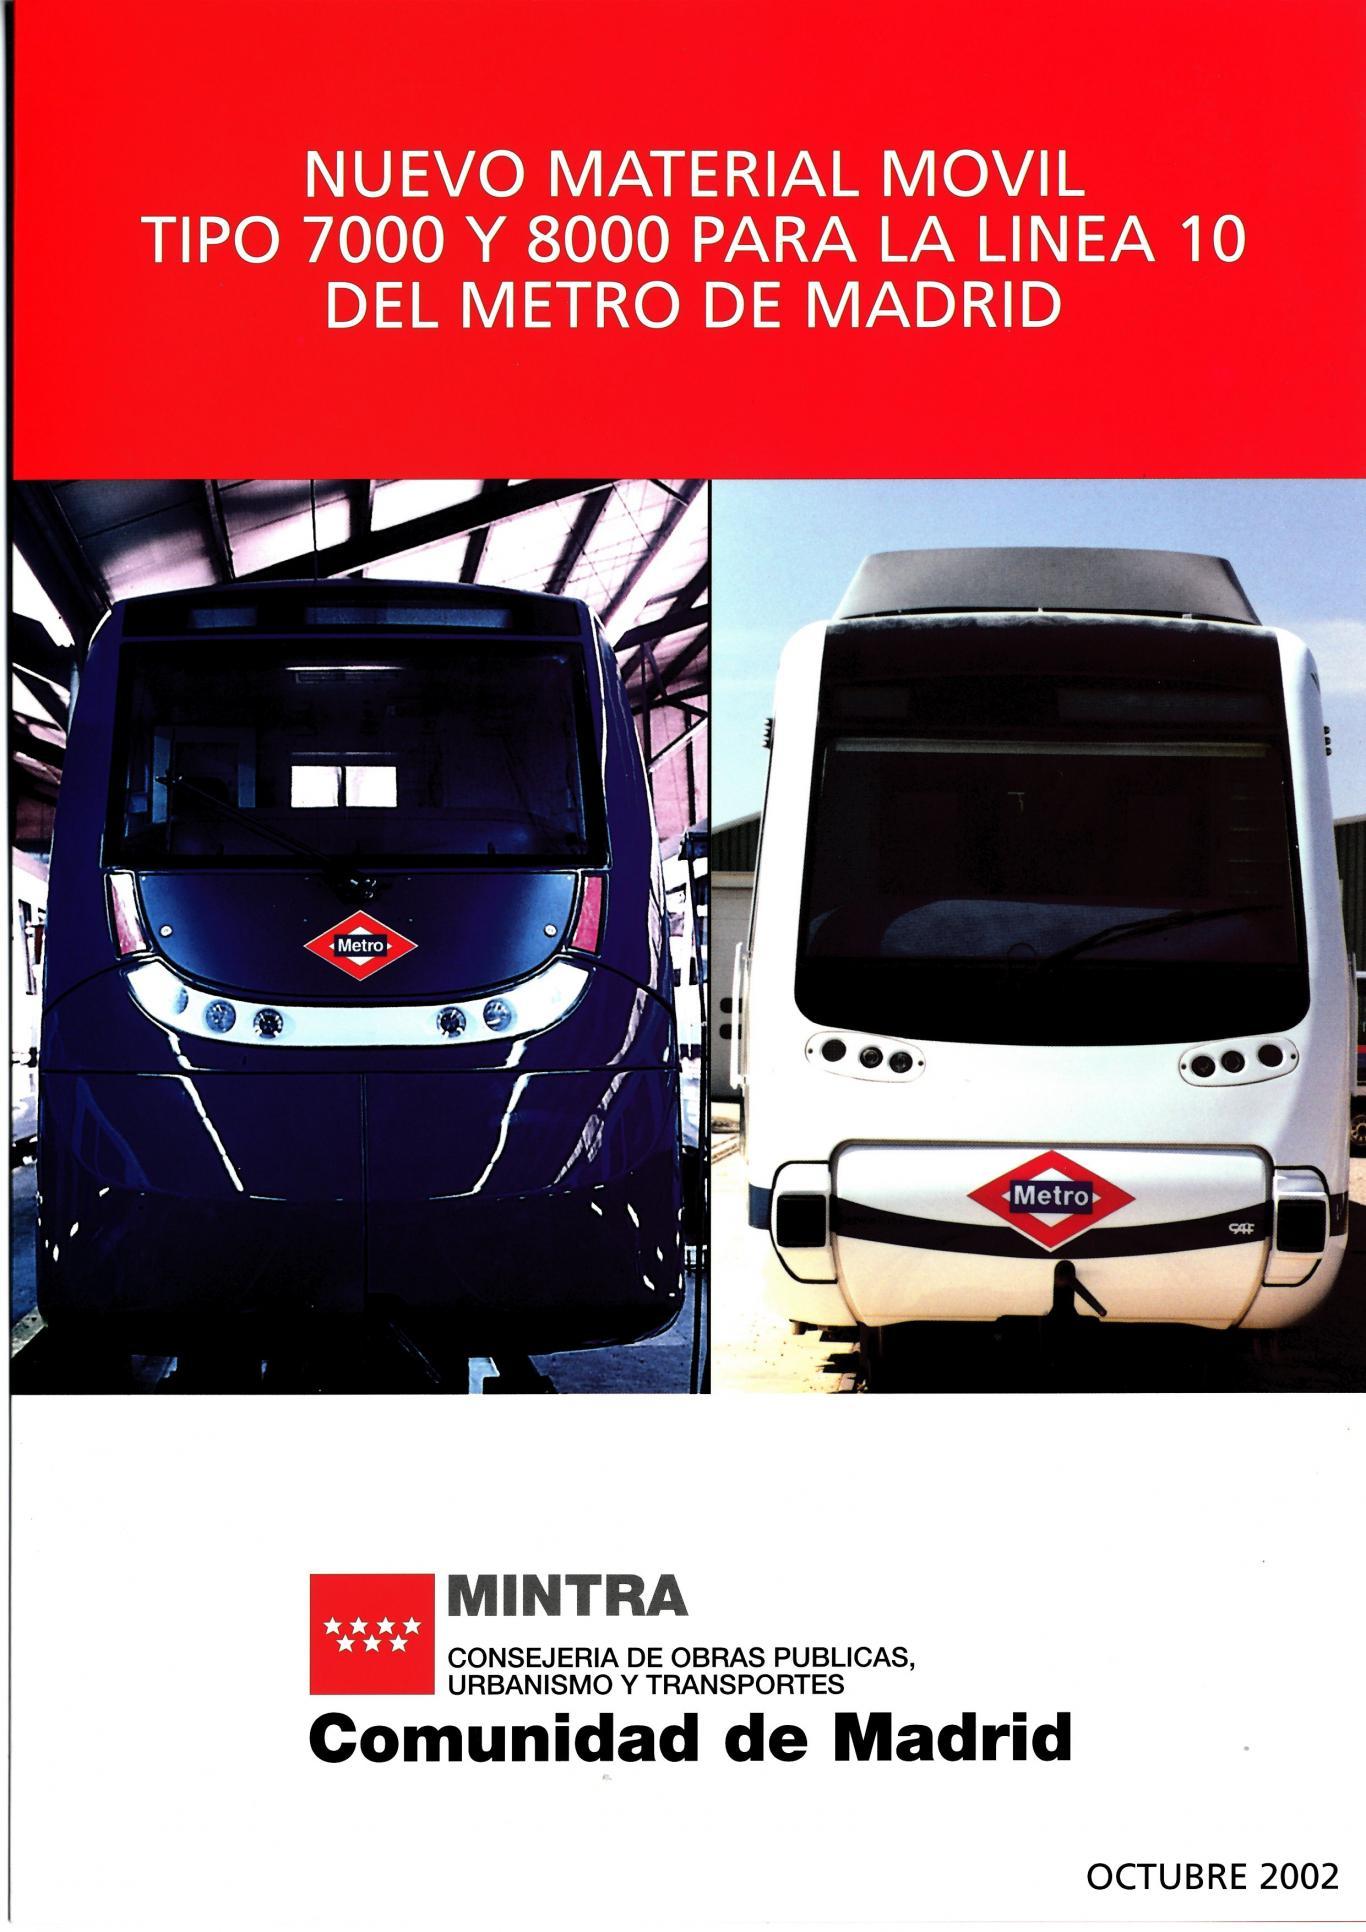 Carátula folleto material móvil L10